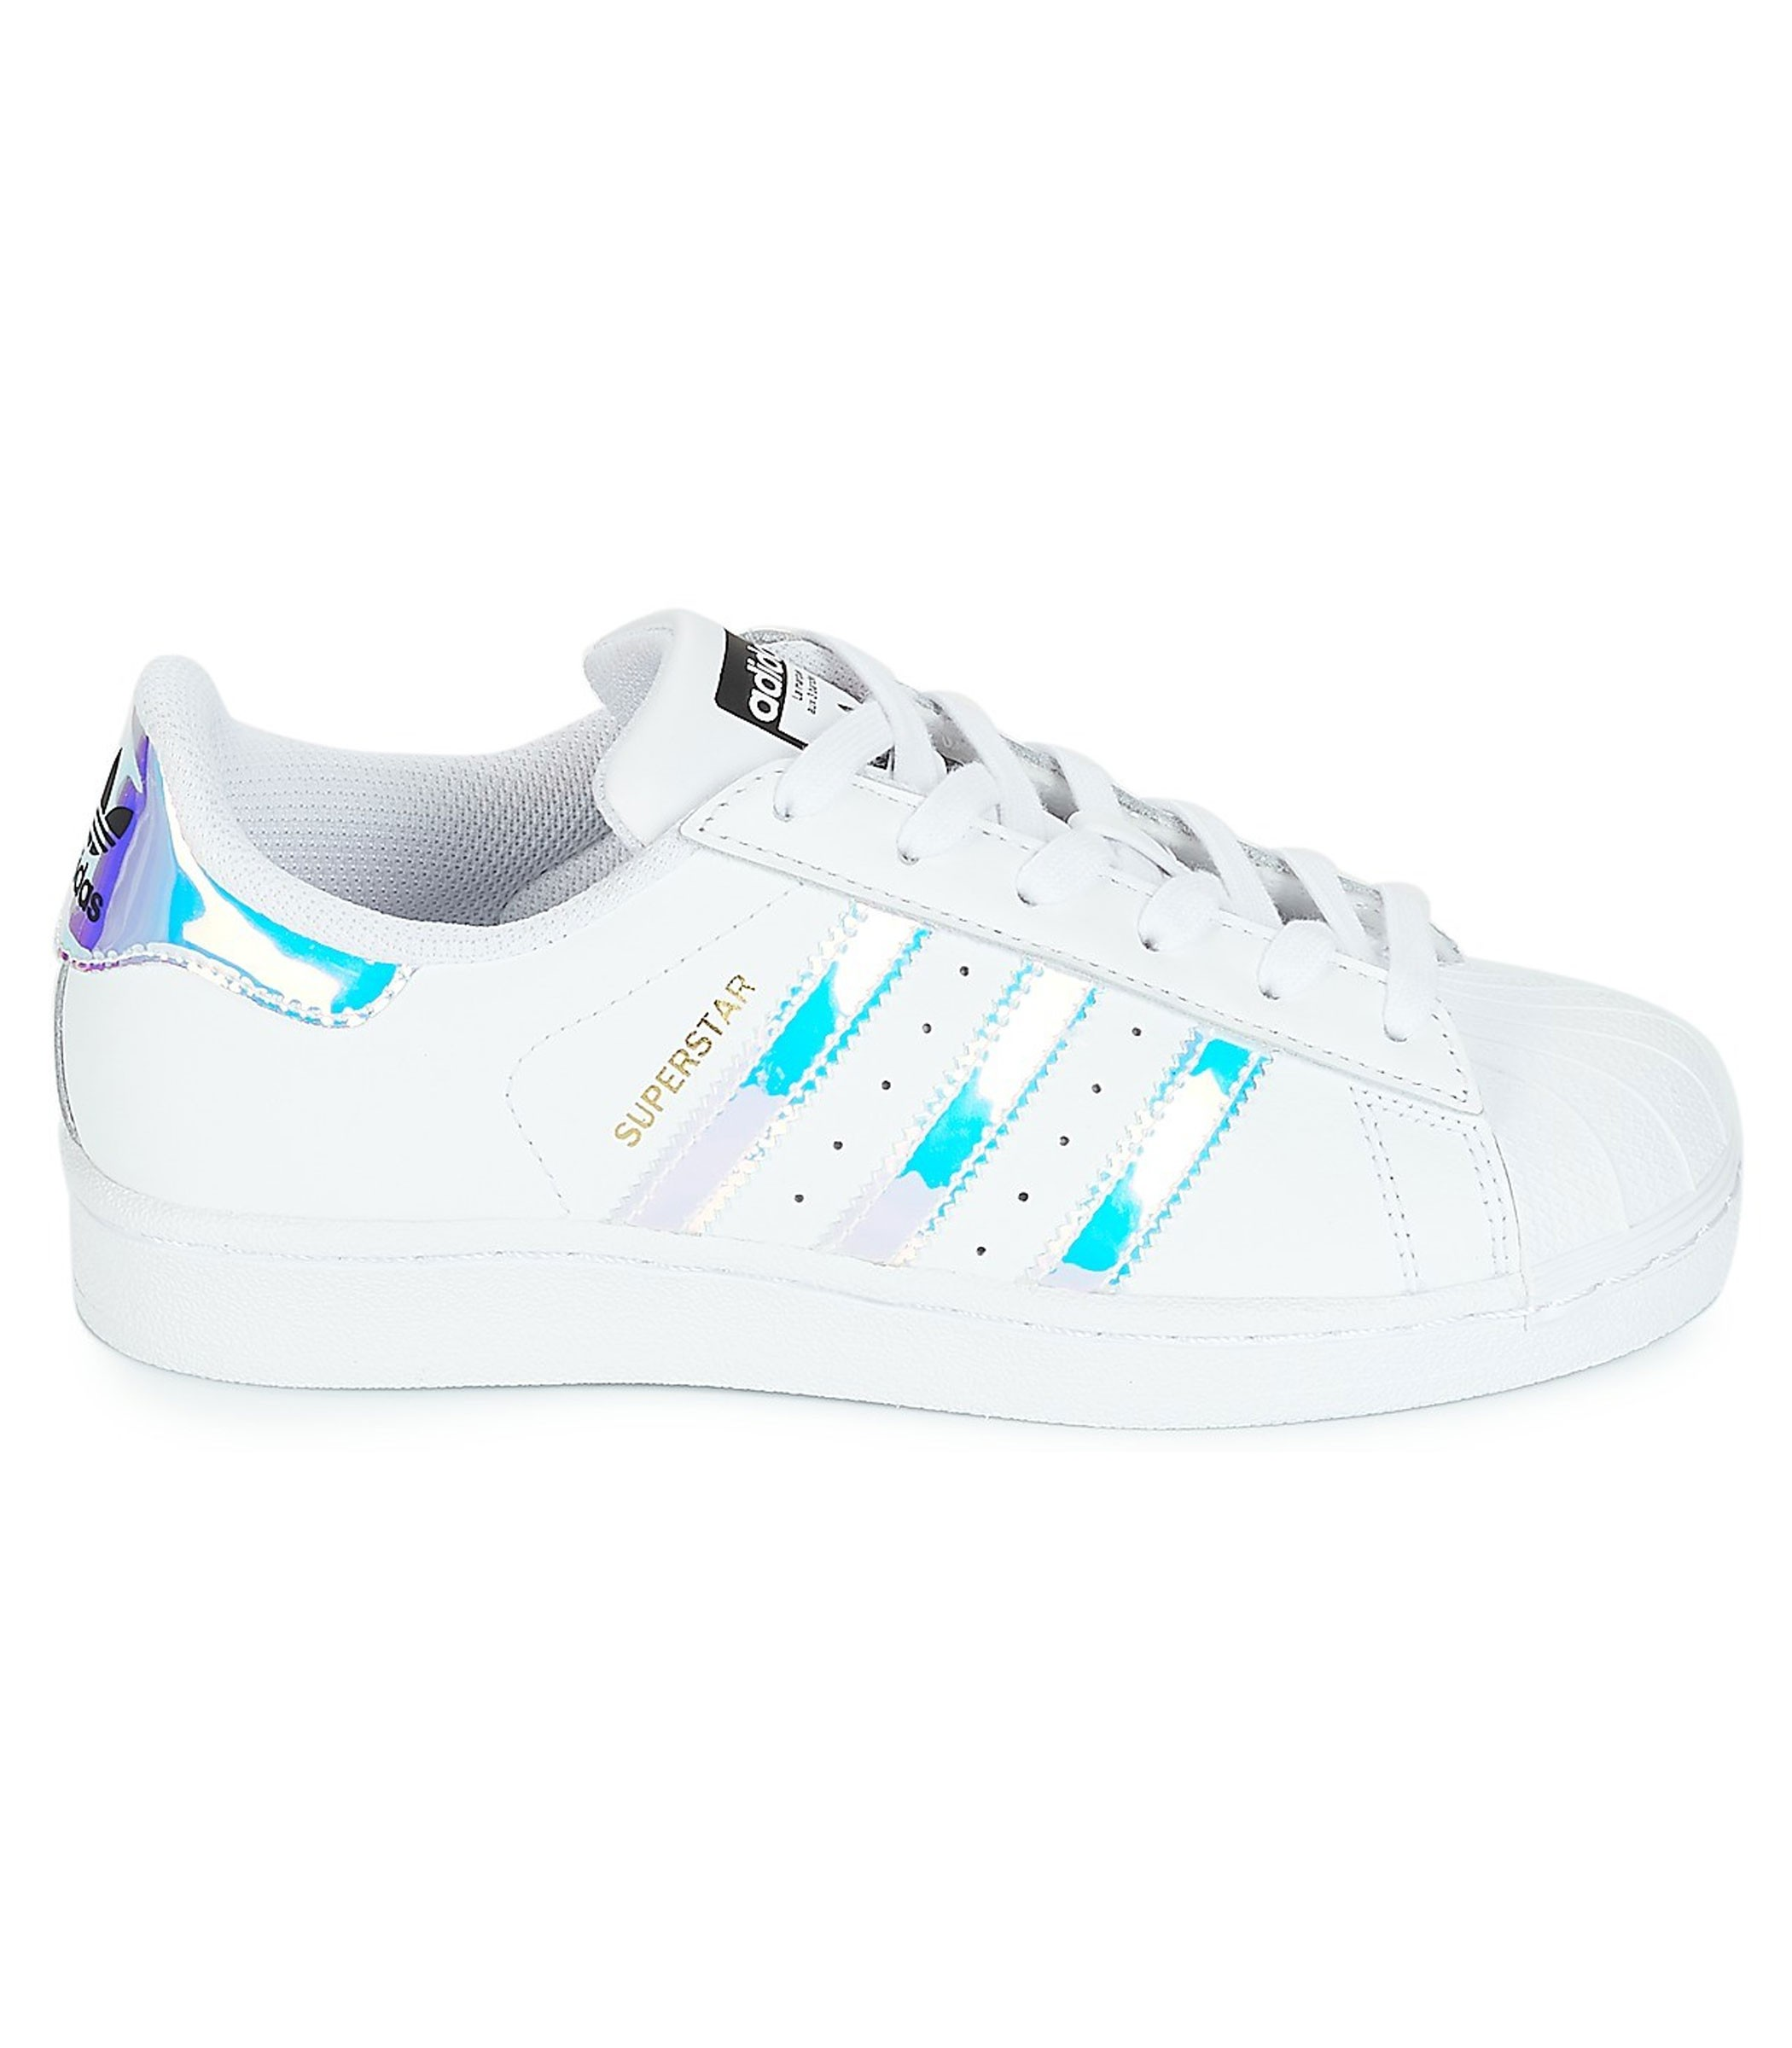 online retailer d726a 545b6 Scarpe Sneakers Adidas Superstar J da ragazza rif. AQ6278